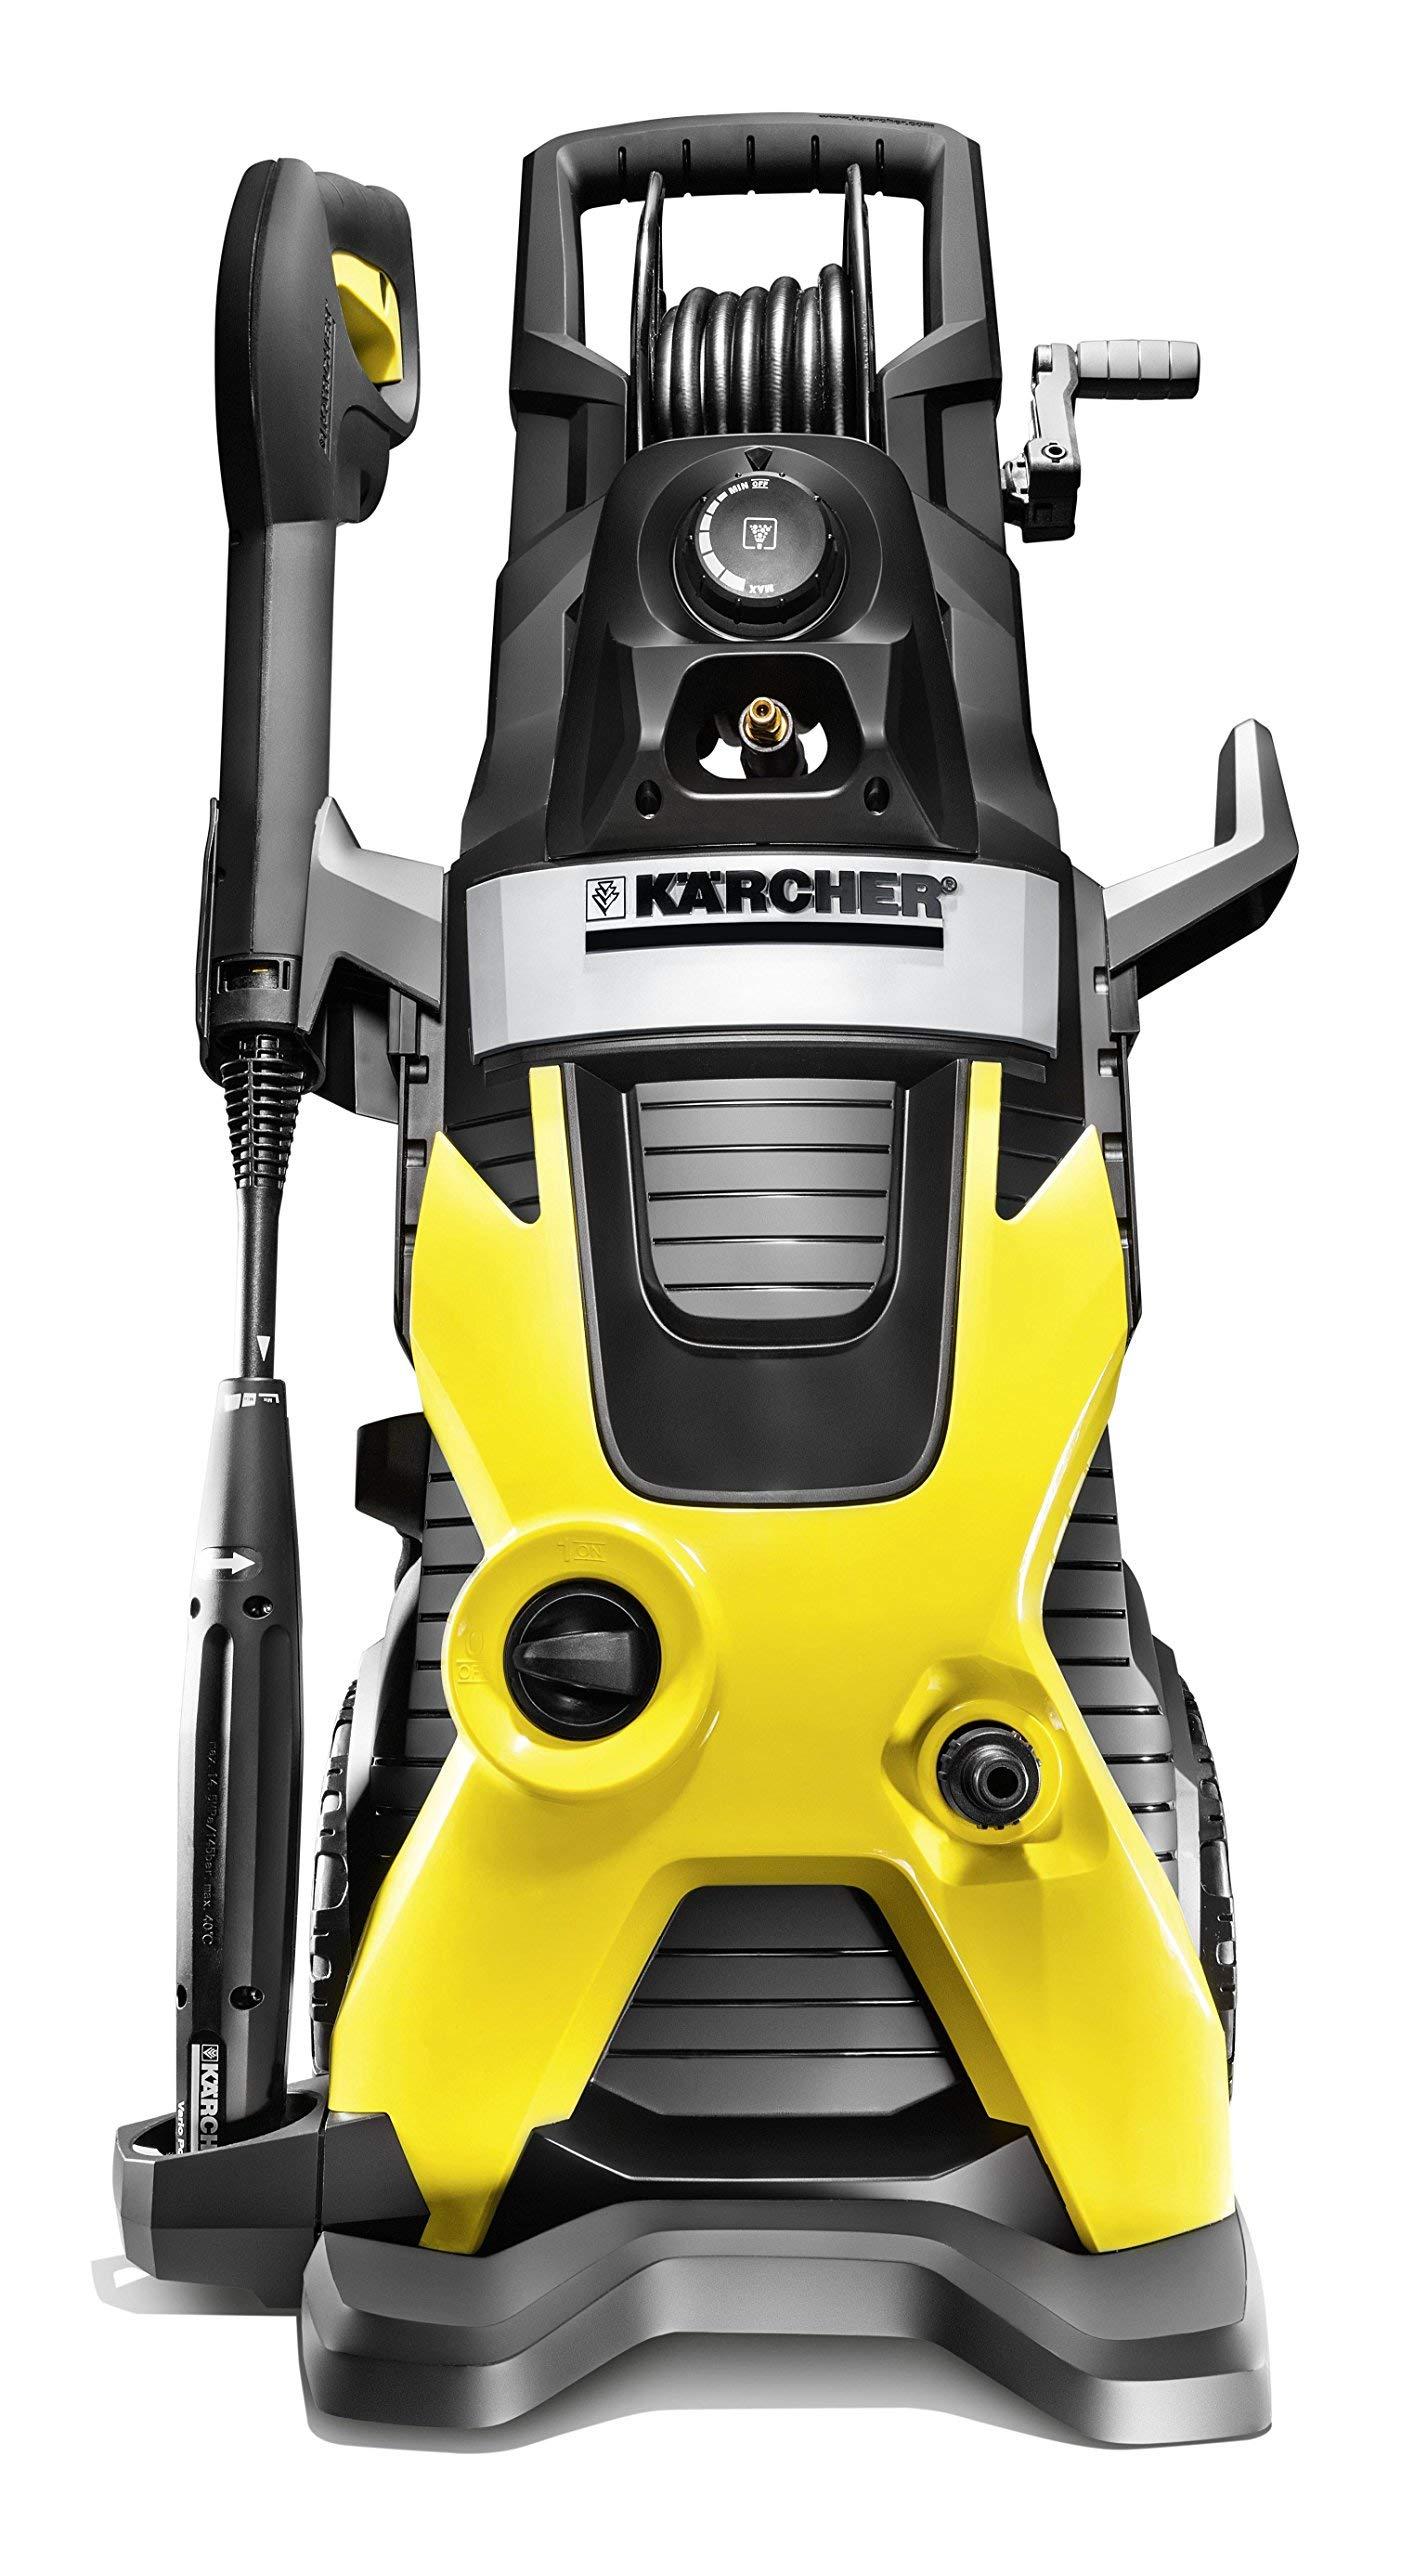 Karcher K5 Premium Electric Power Pressure